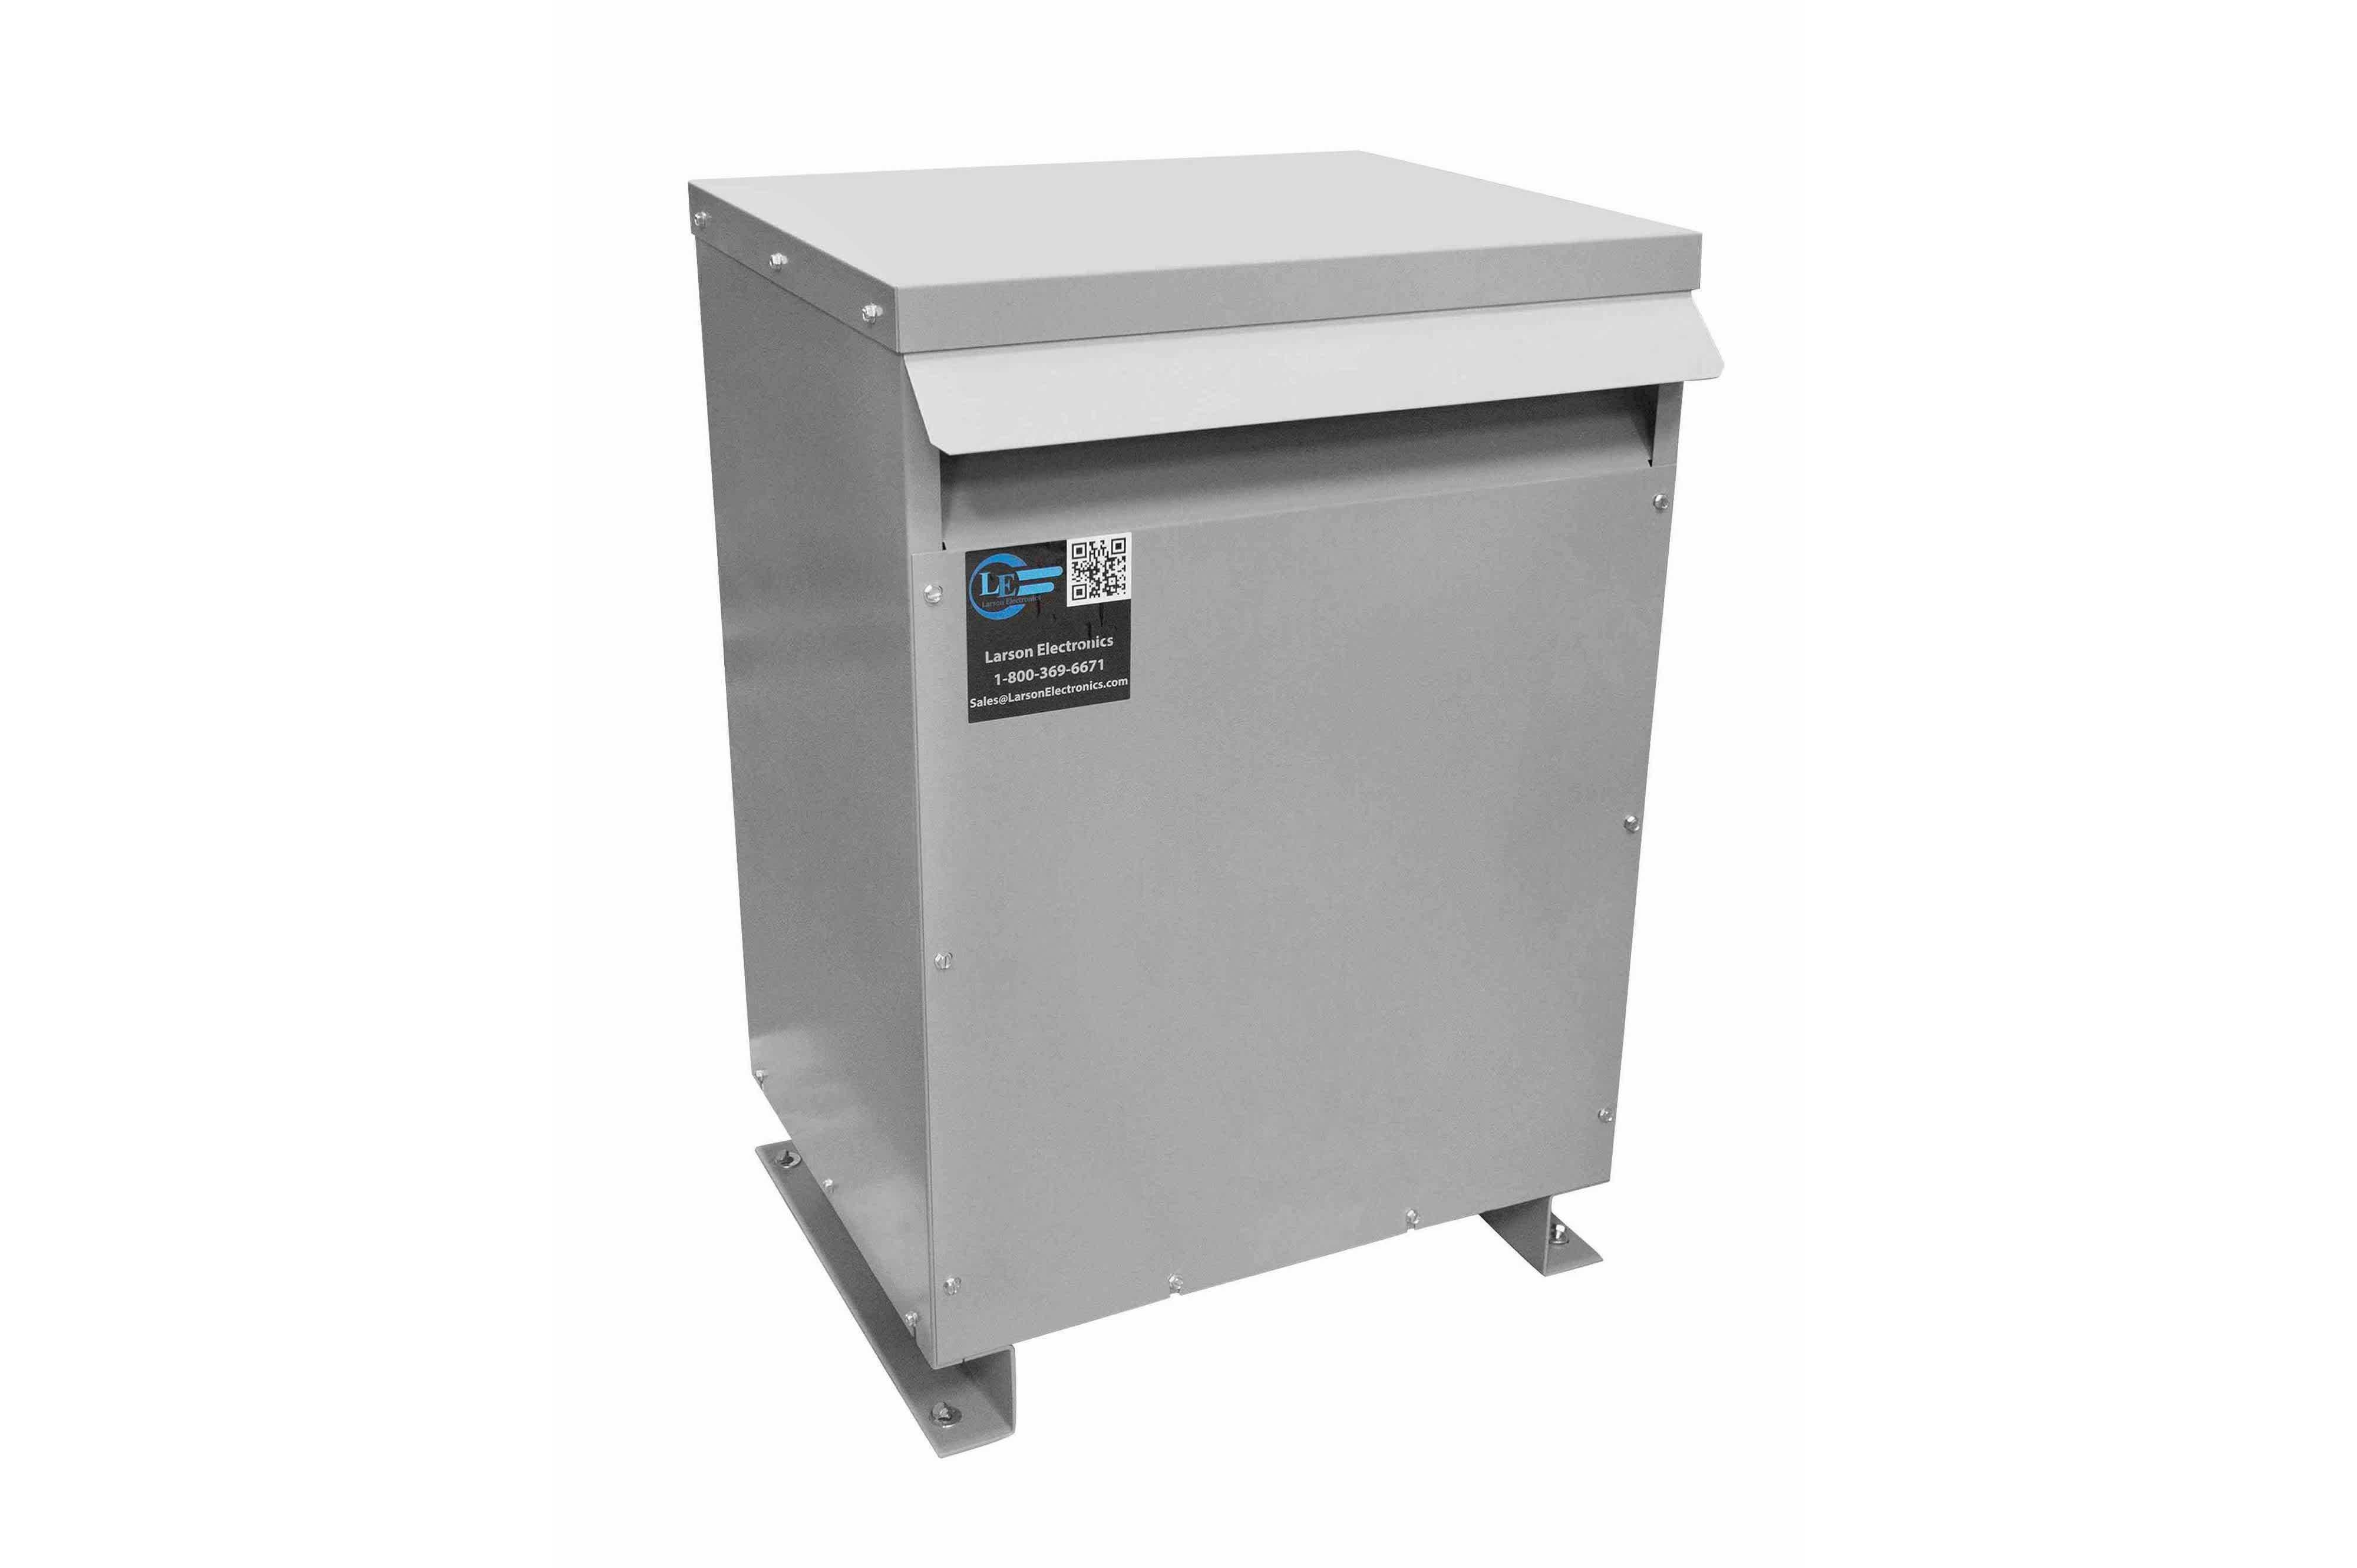 15 kVA 3PH Isolation Transformer, 400V Wye Primary, 480V Delta Secondary, N3R, Ventilated, 60 Hz